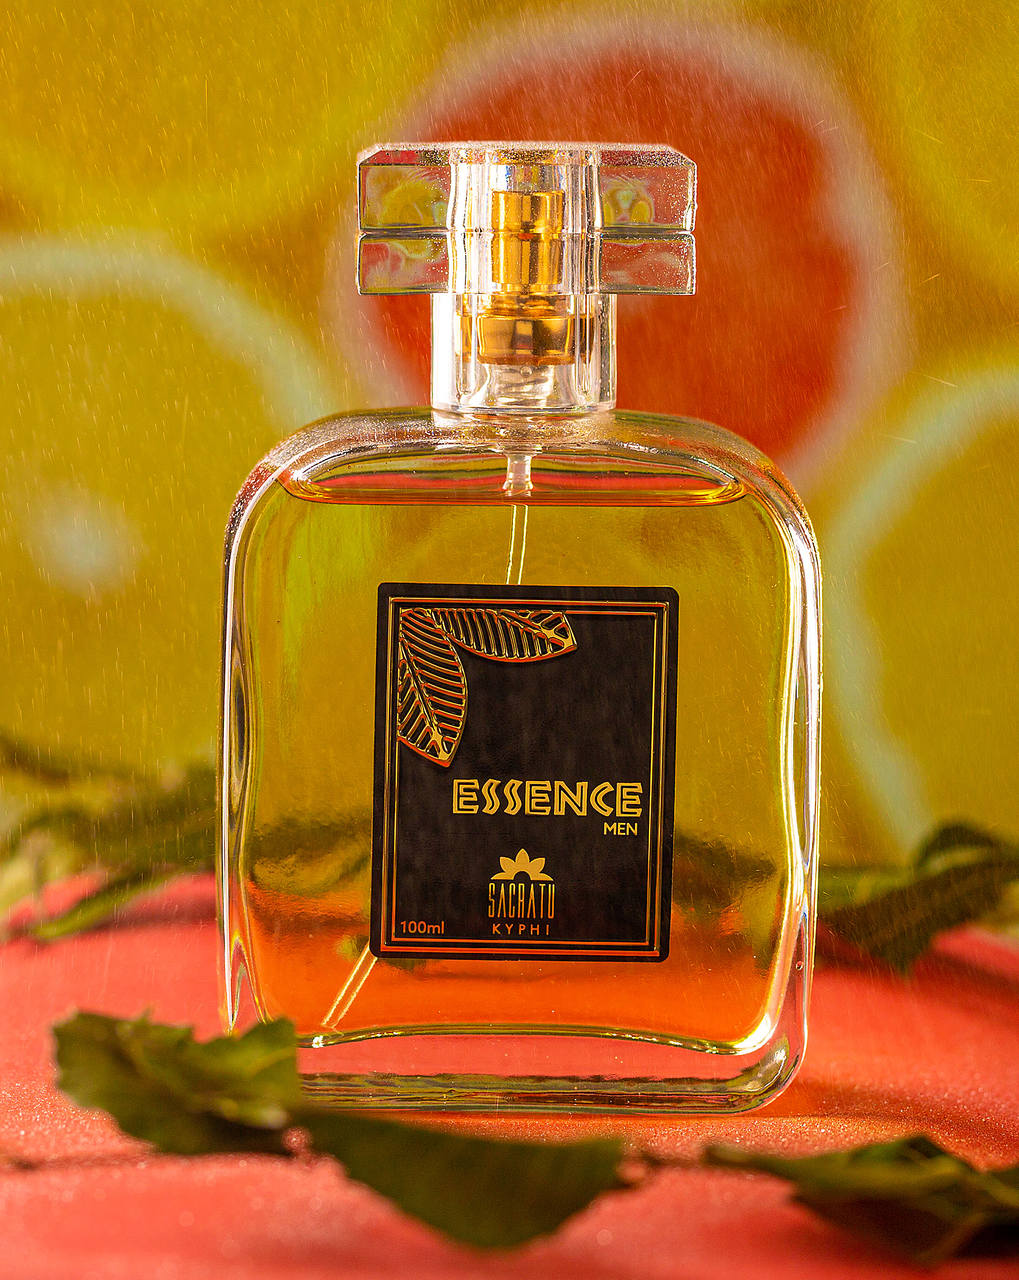 ESSENCE Inspirado em Dolce Gabbana Pour Homme by Dolce Gabbana